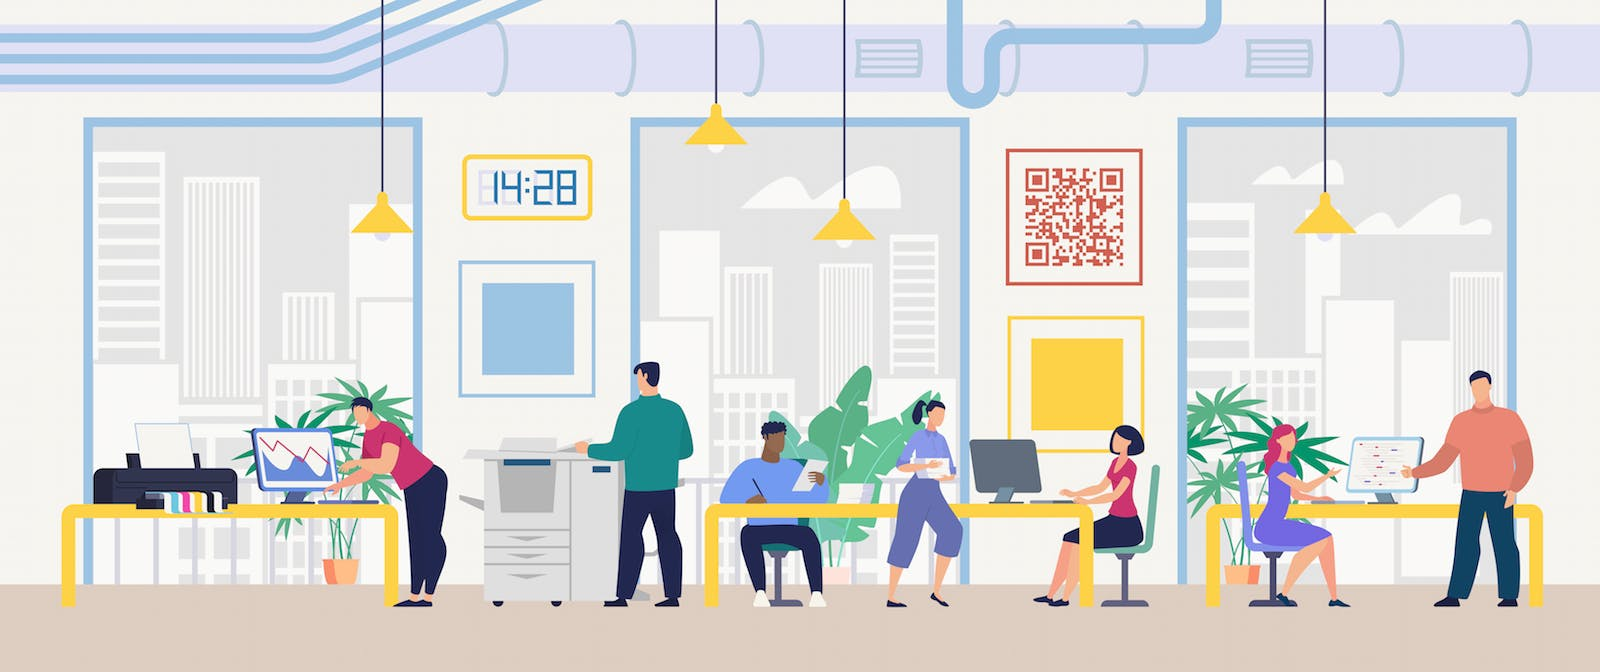 2019 VergeSense Office Utilization and Workspace Engagement Report